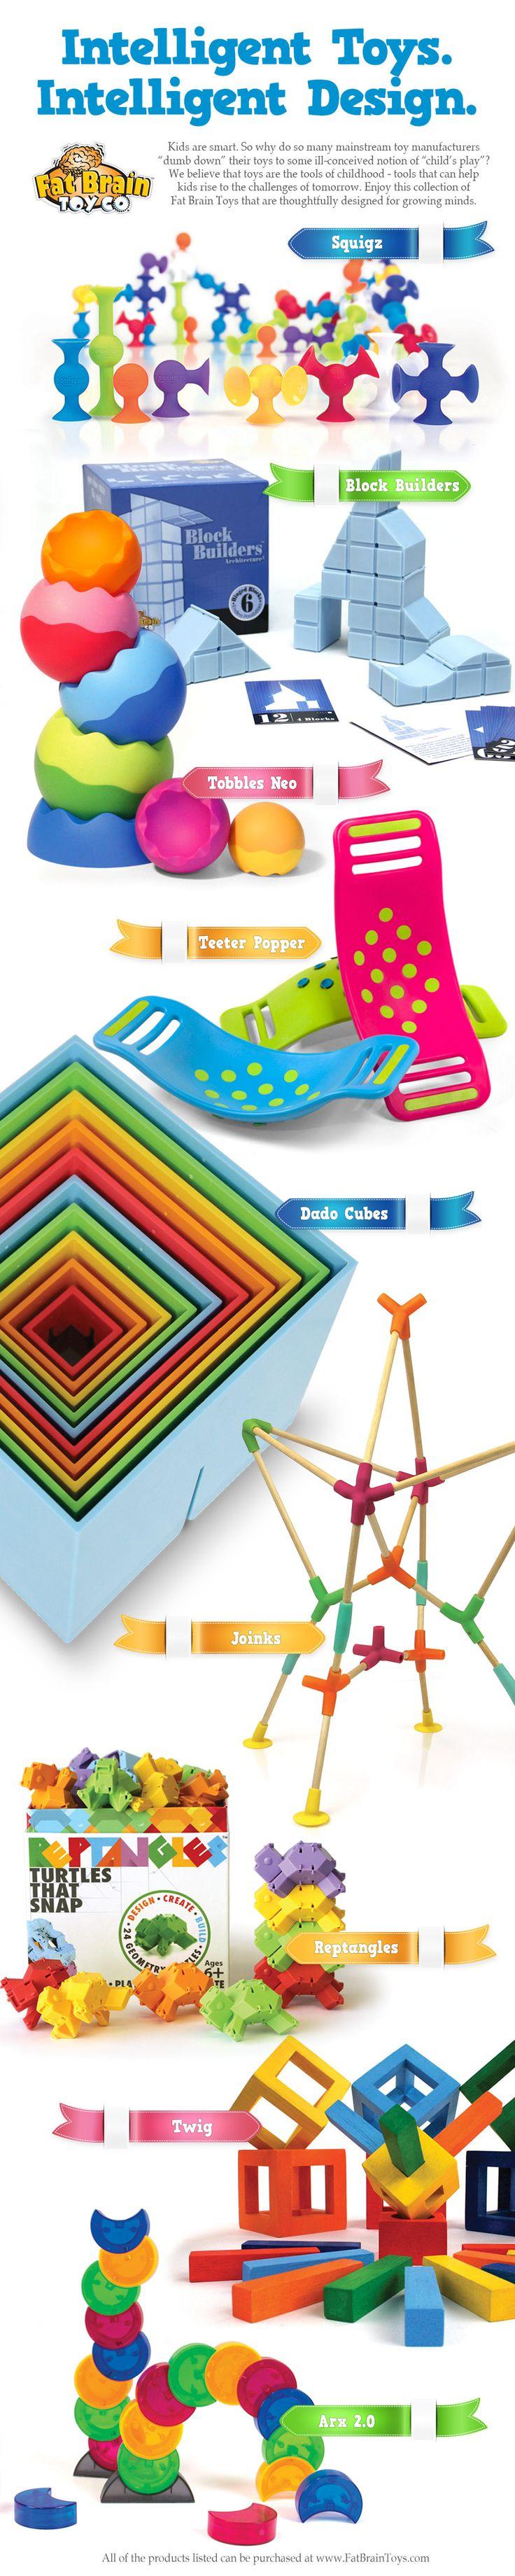 Intelligent Toys. Intelligent Design.